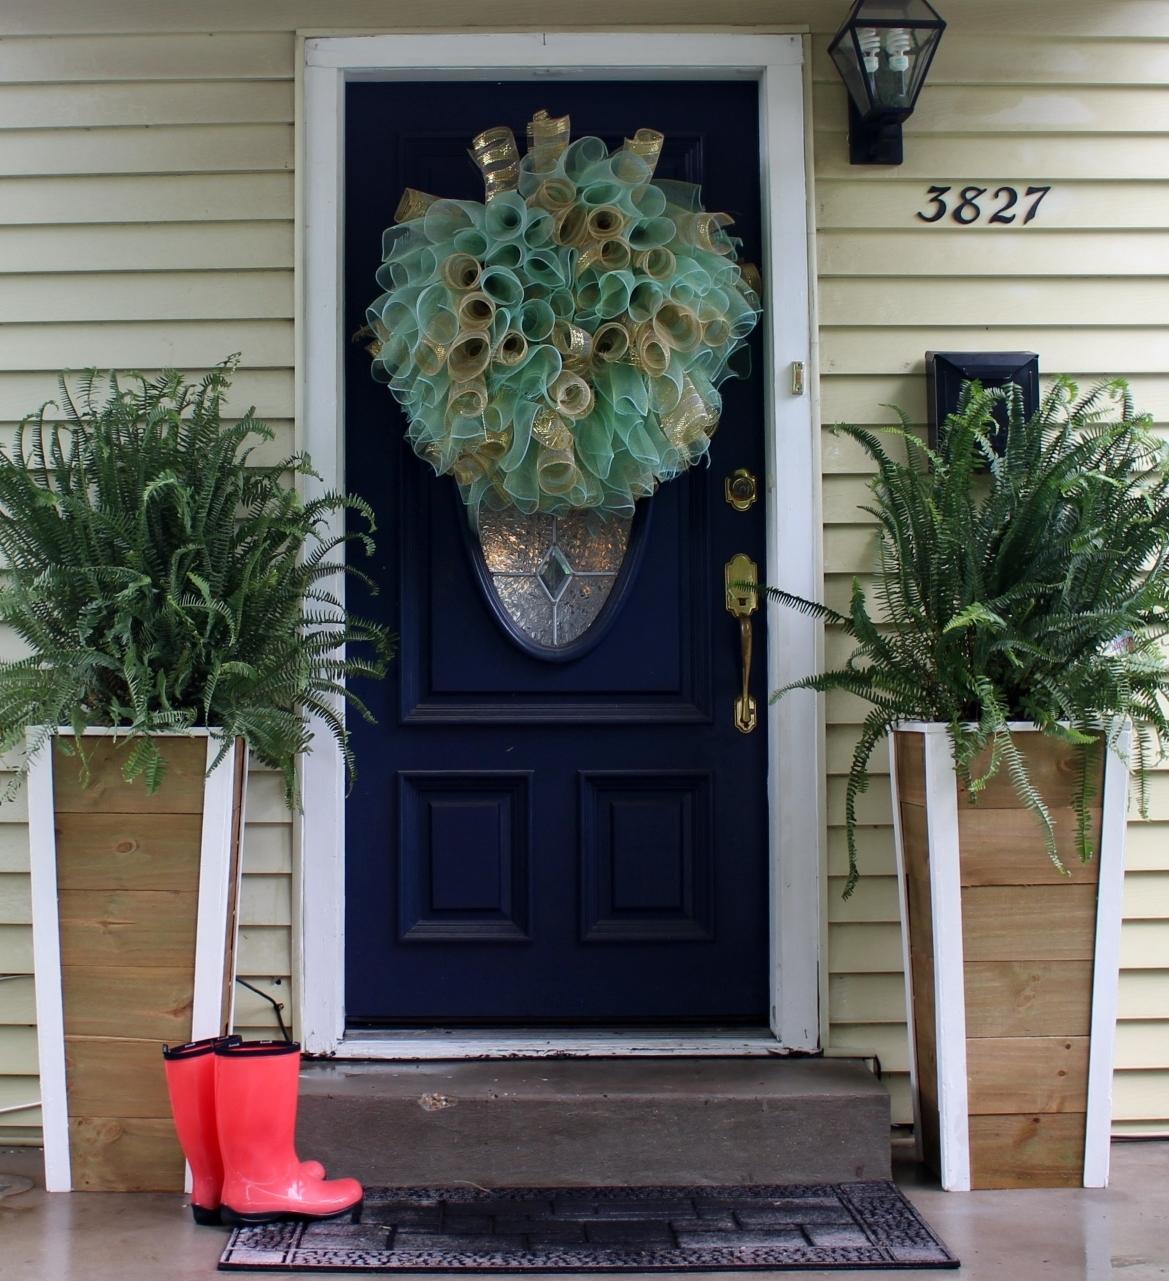 Nadia's DIY Projects: DIY Fern Planters